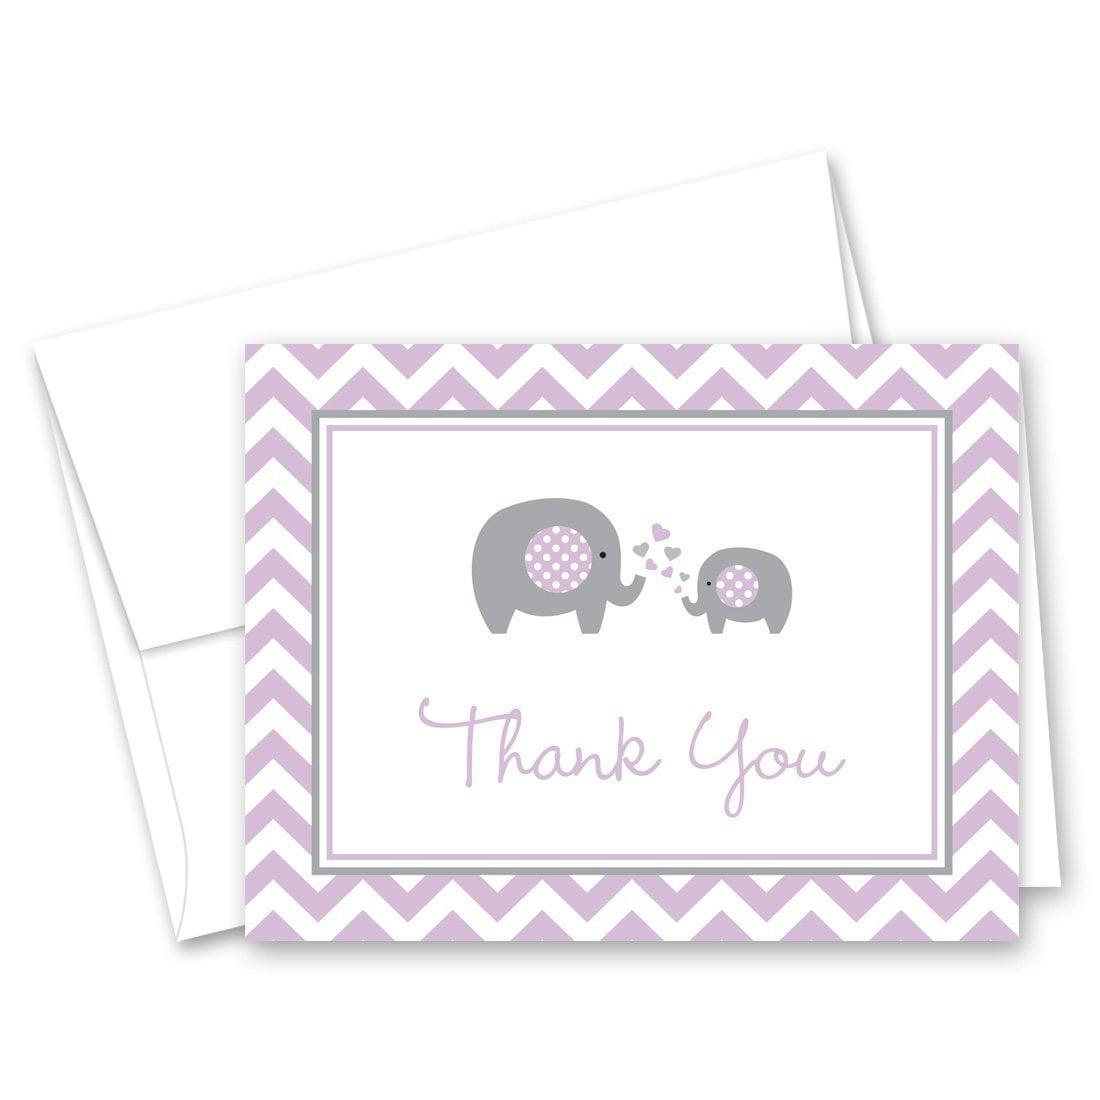 50 Purple Chevron Elephant Baby Shower Thank You Cards Walmart Com